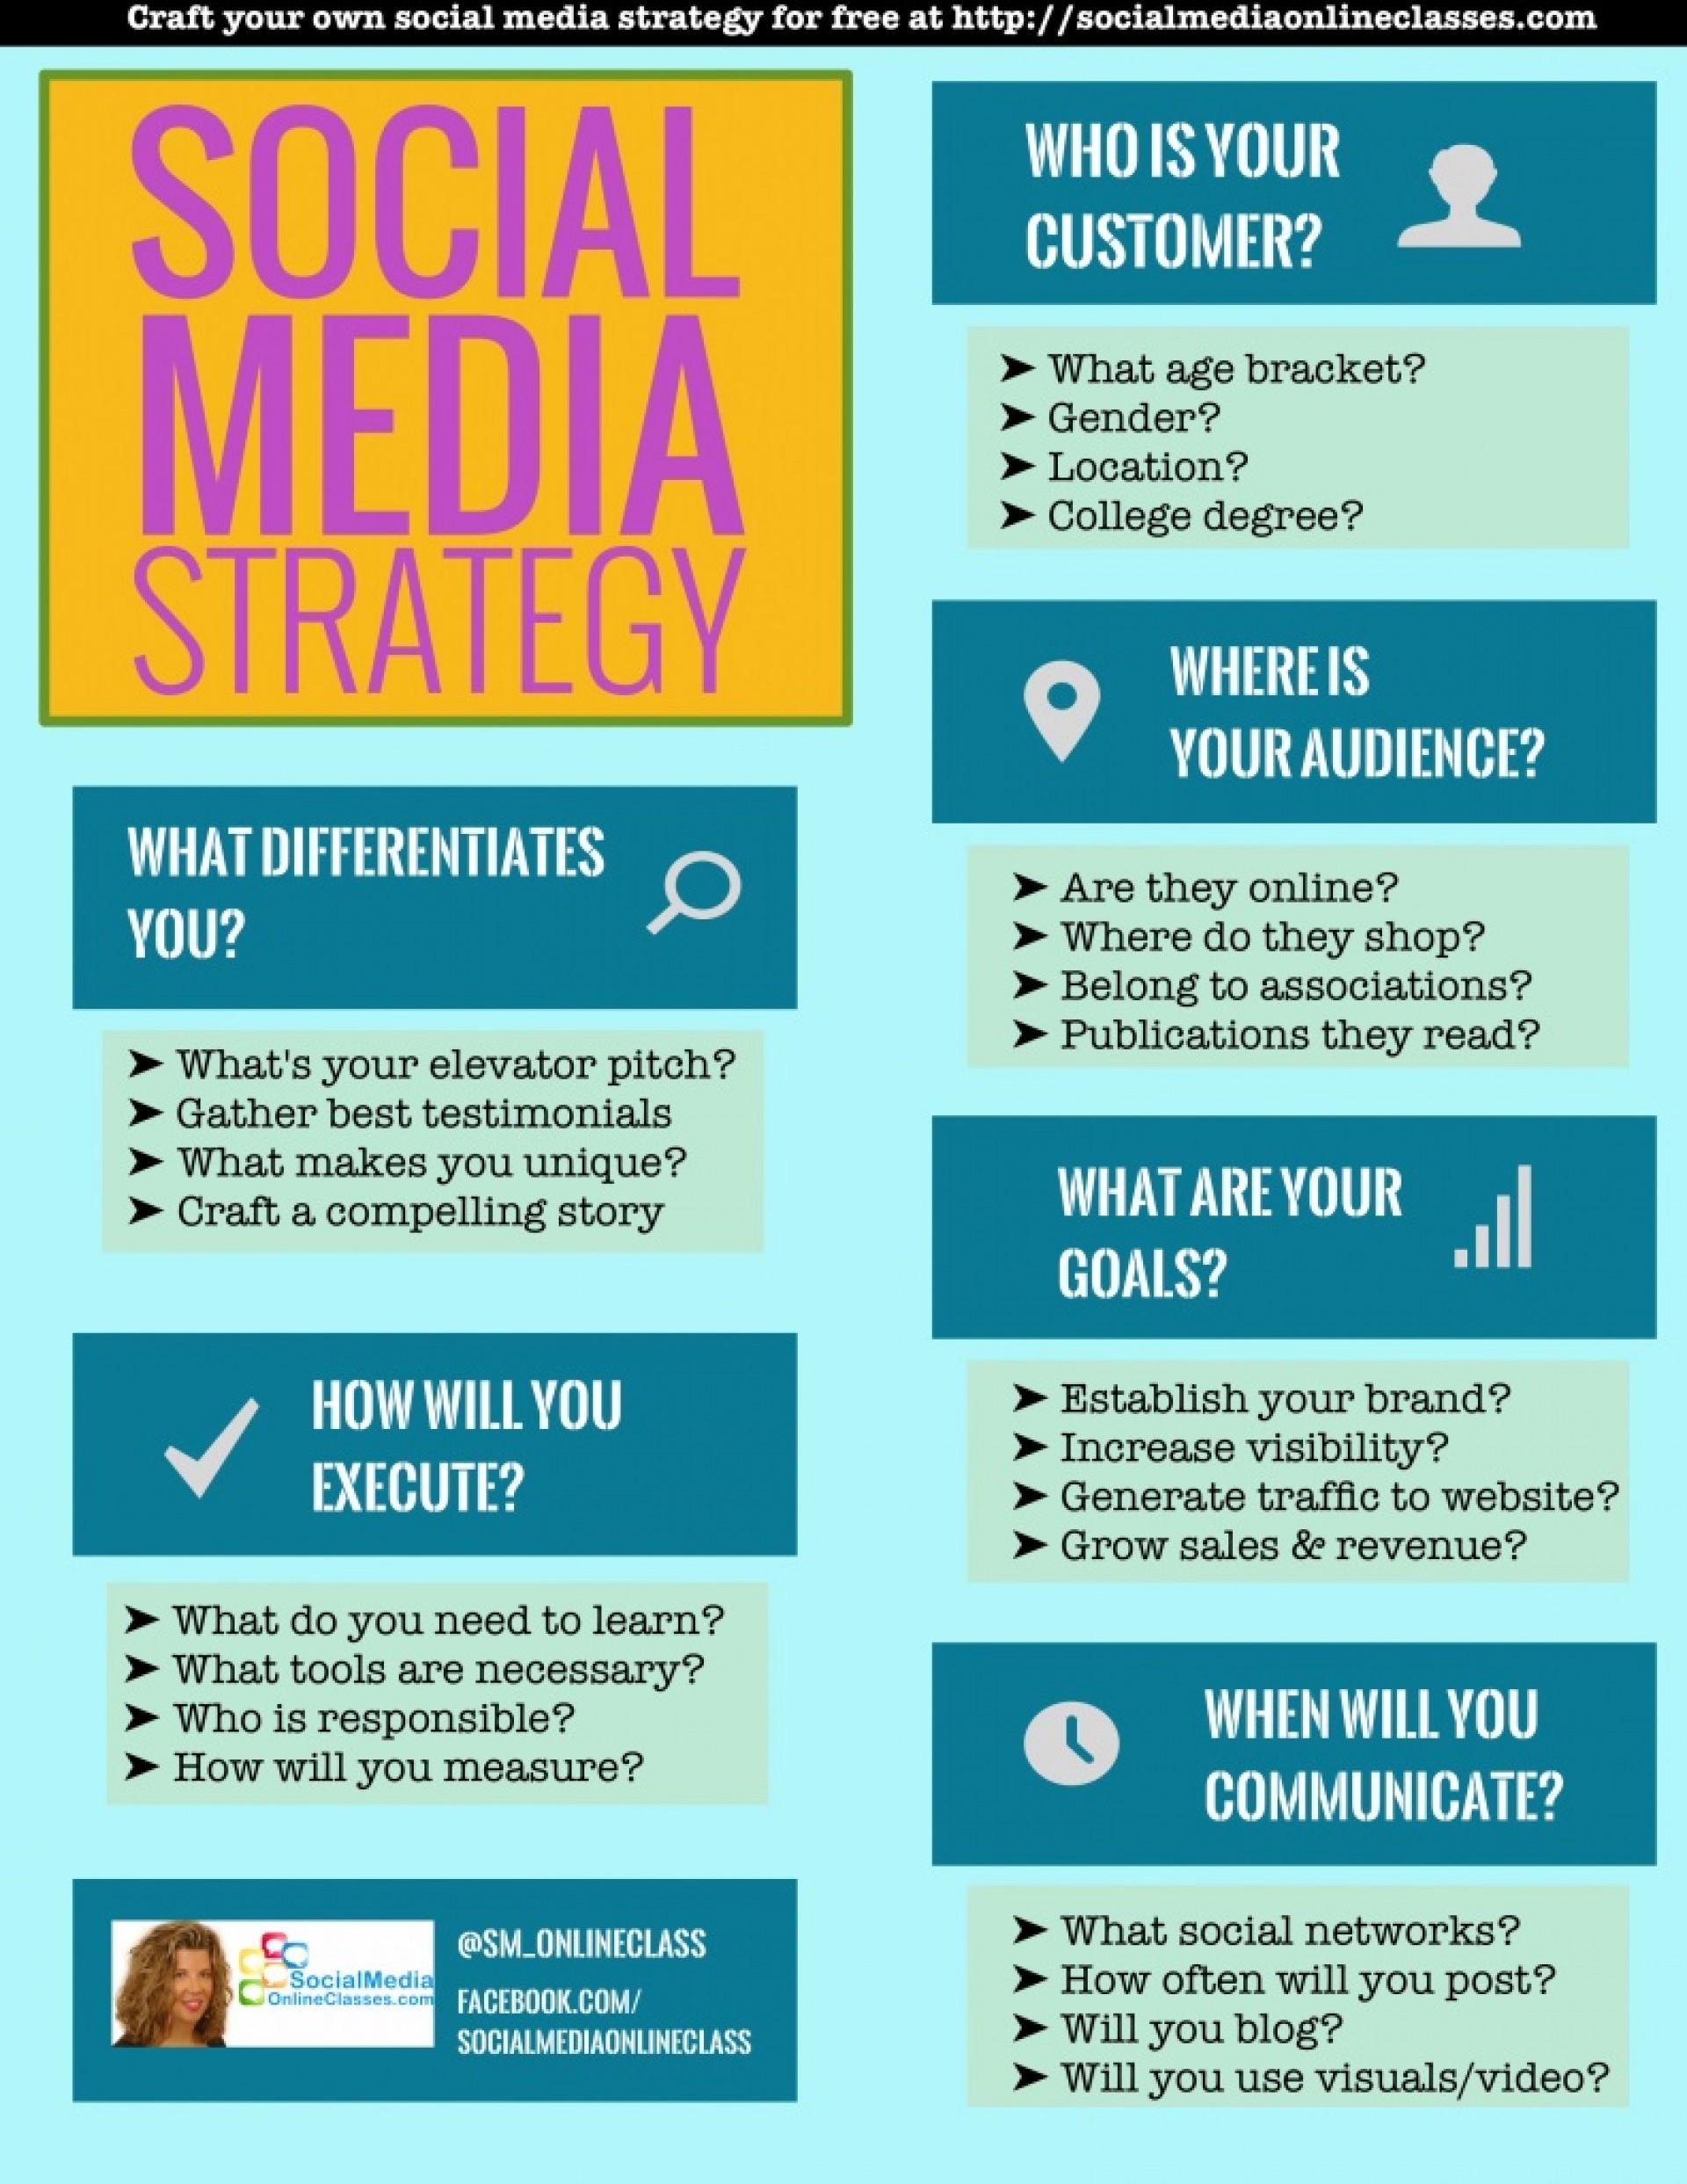 006 Sensational Social Media Strategy Template Pdf Photo  Sample Content1920